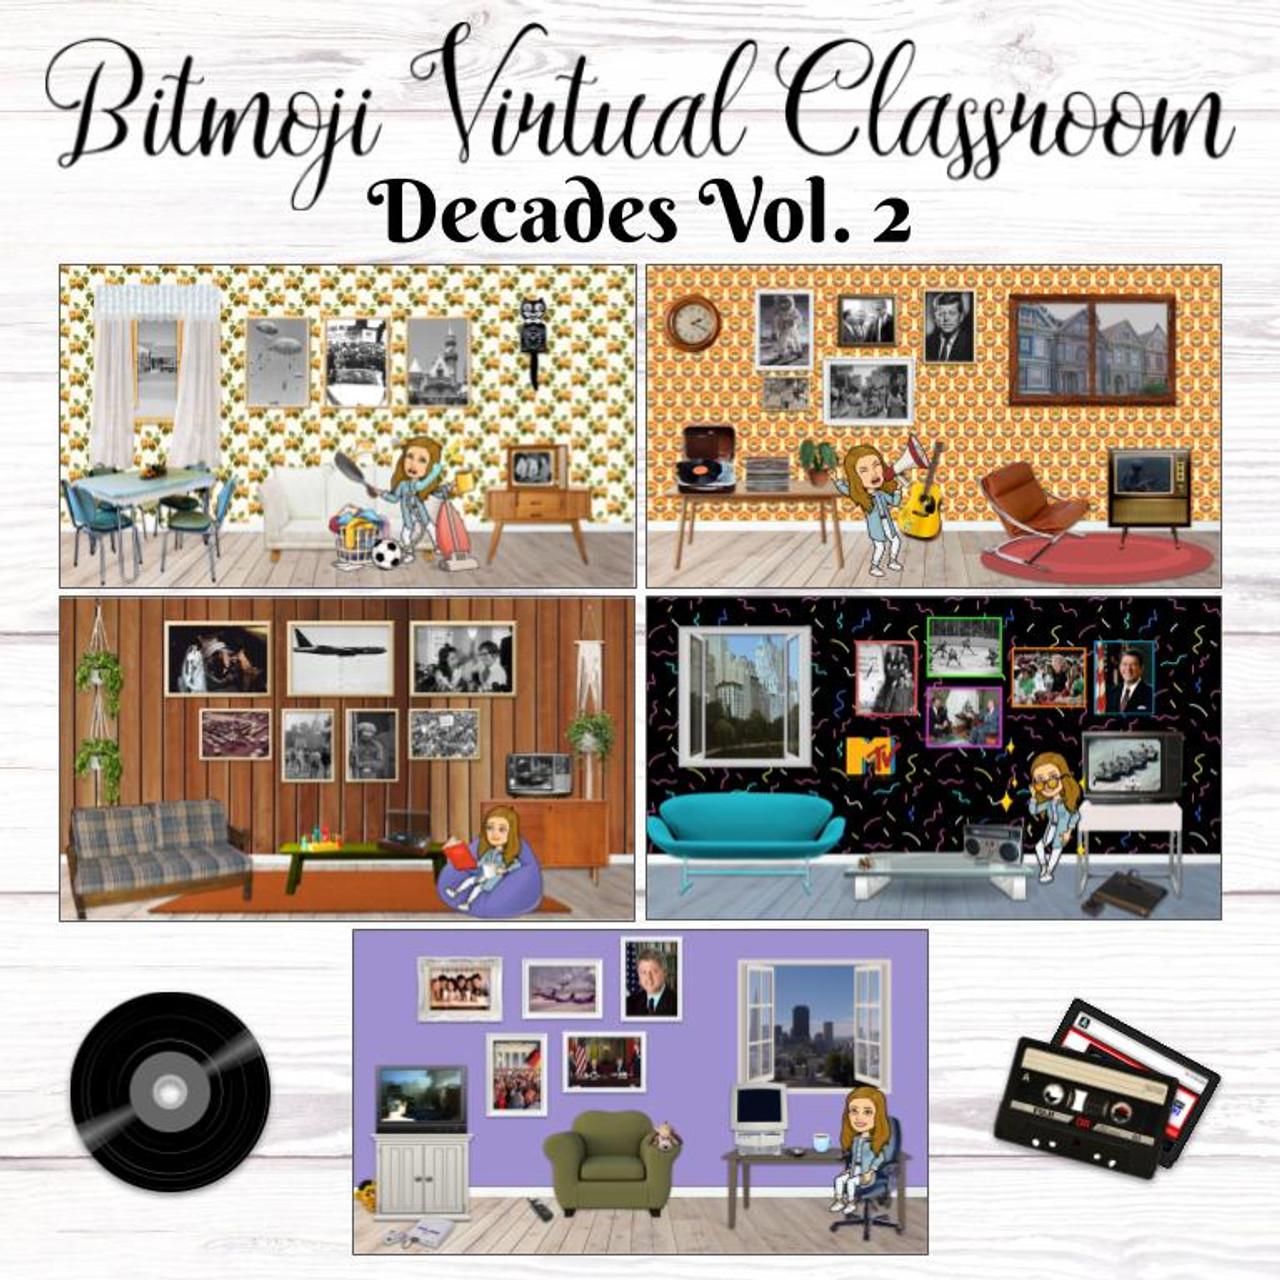 Bitmoji Virtual Classroom - Decades (1950-1990s)